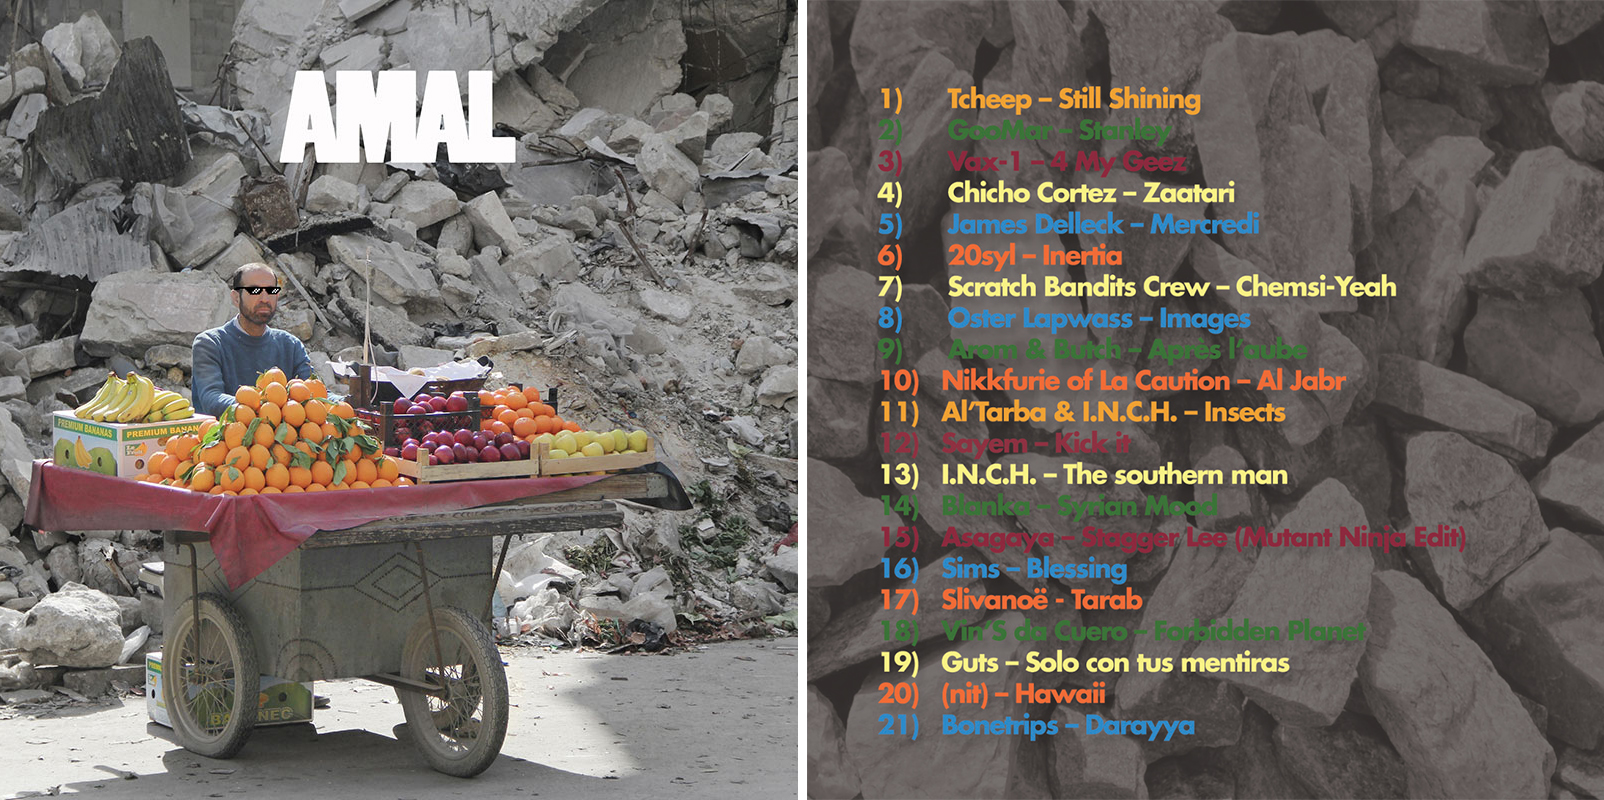 amal tracklist